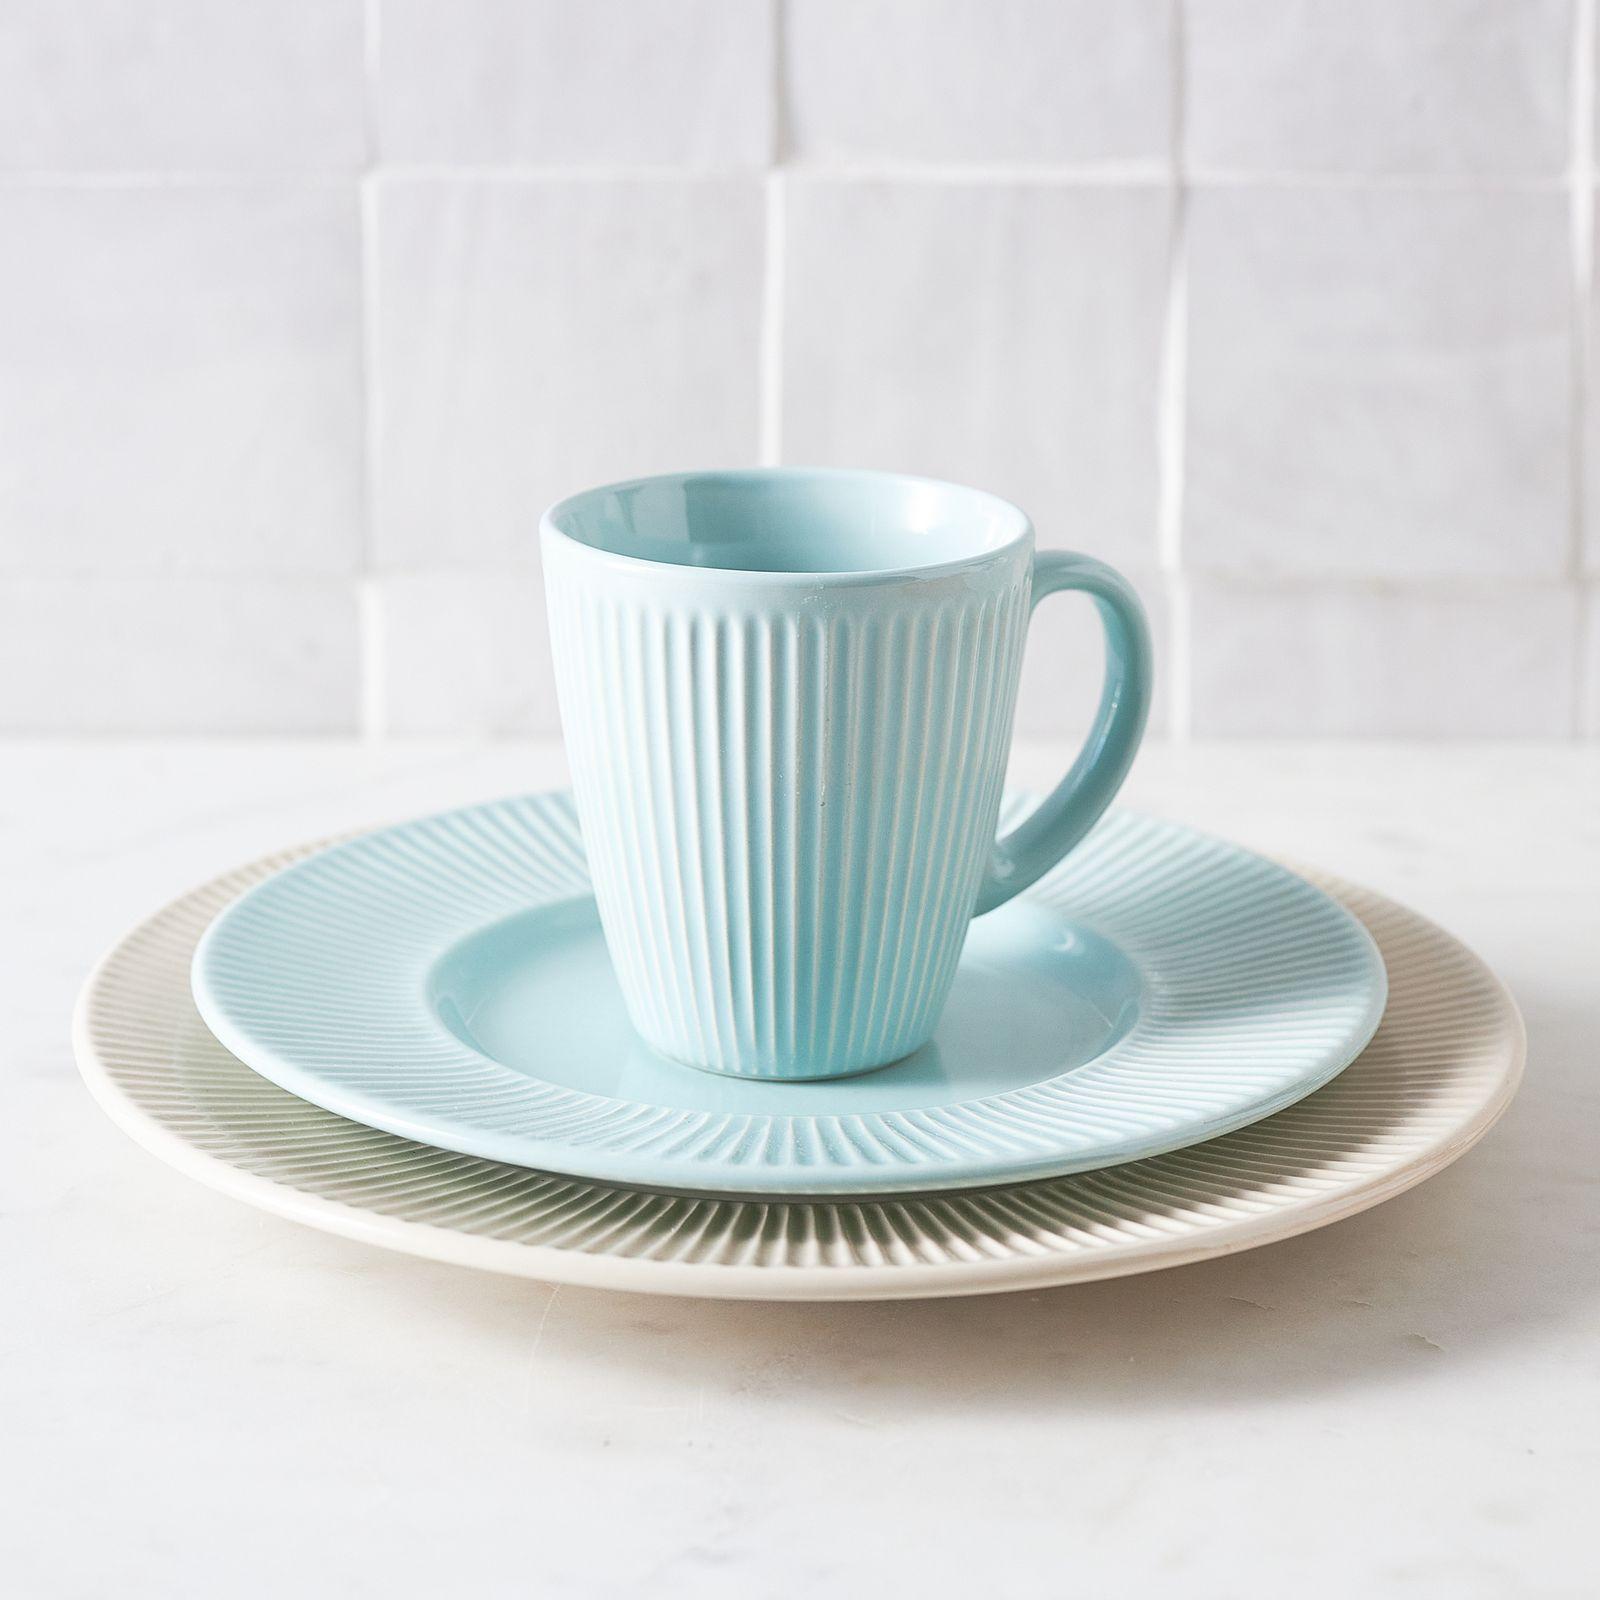 Dessertteller Palette Light Blue 22.5 cm AMBITION